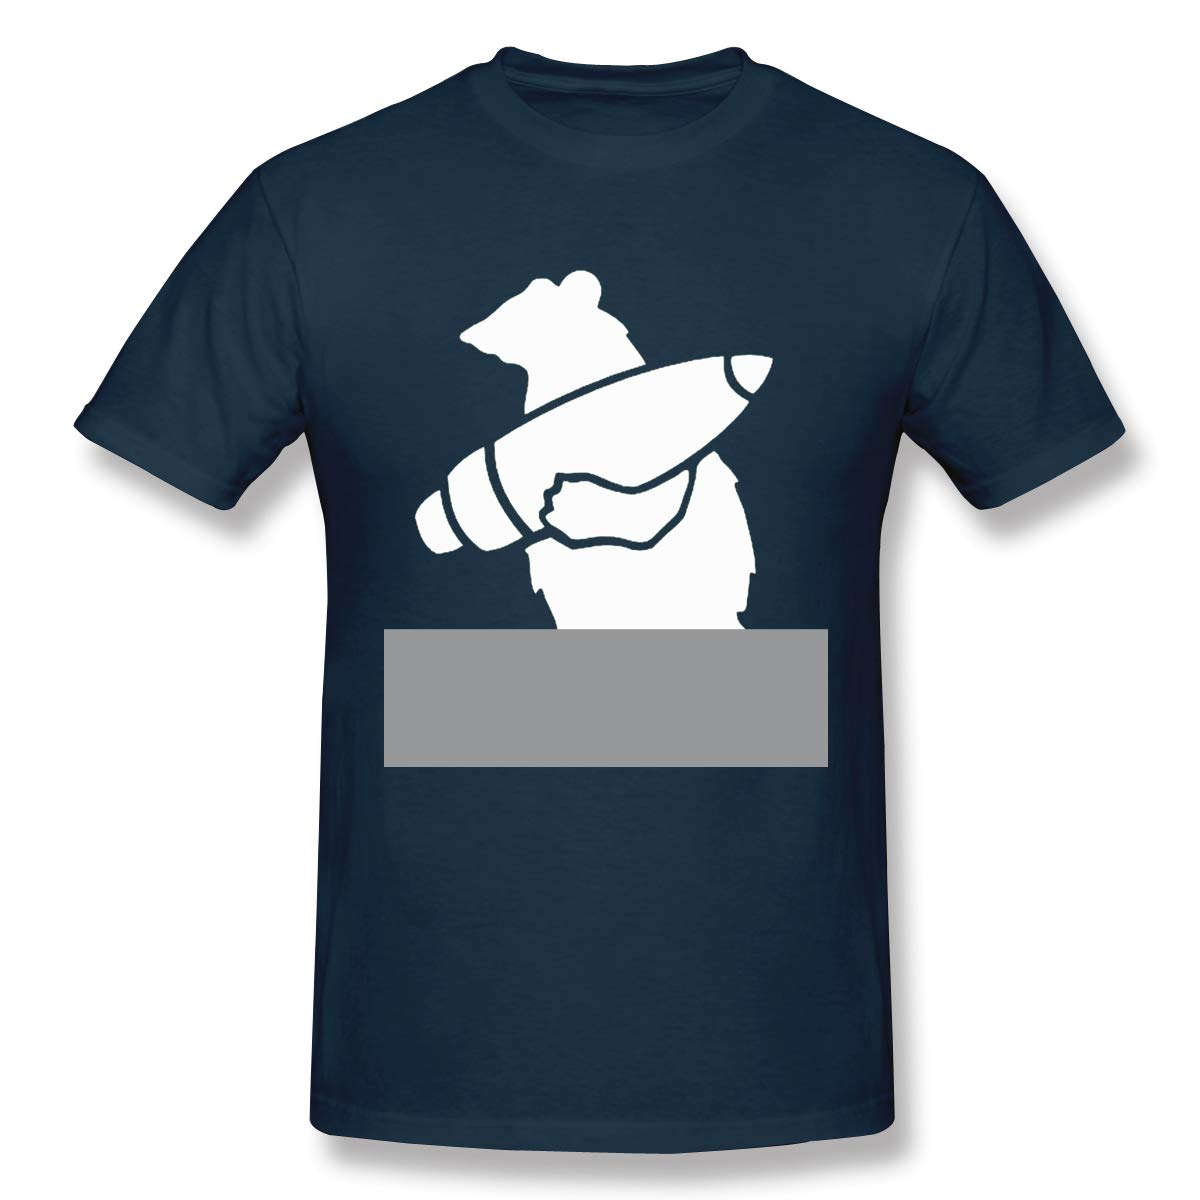 S Wojtek The Bear Comfortable Tshirts Navy